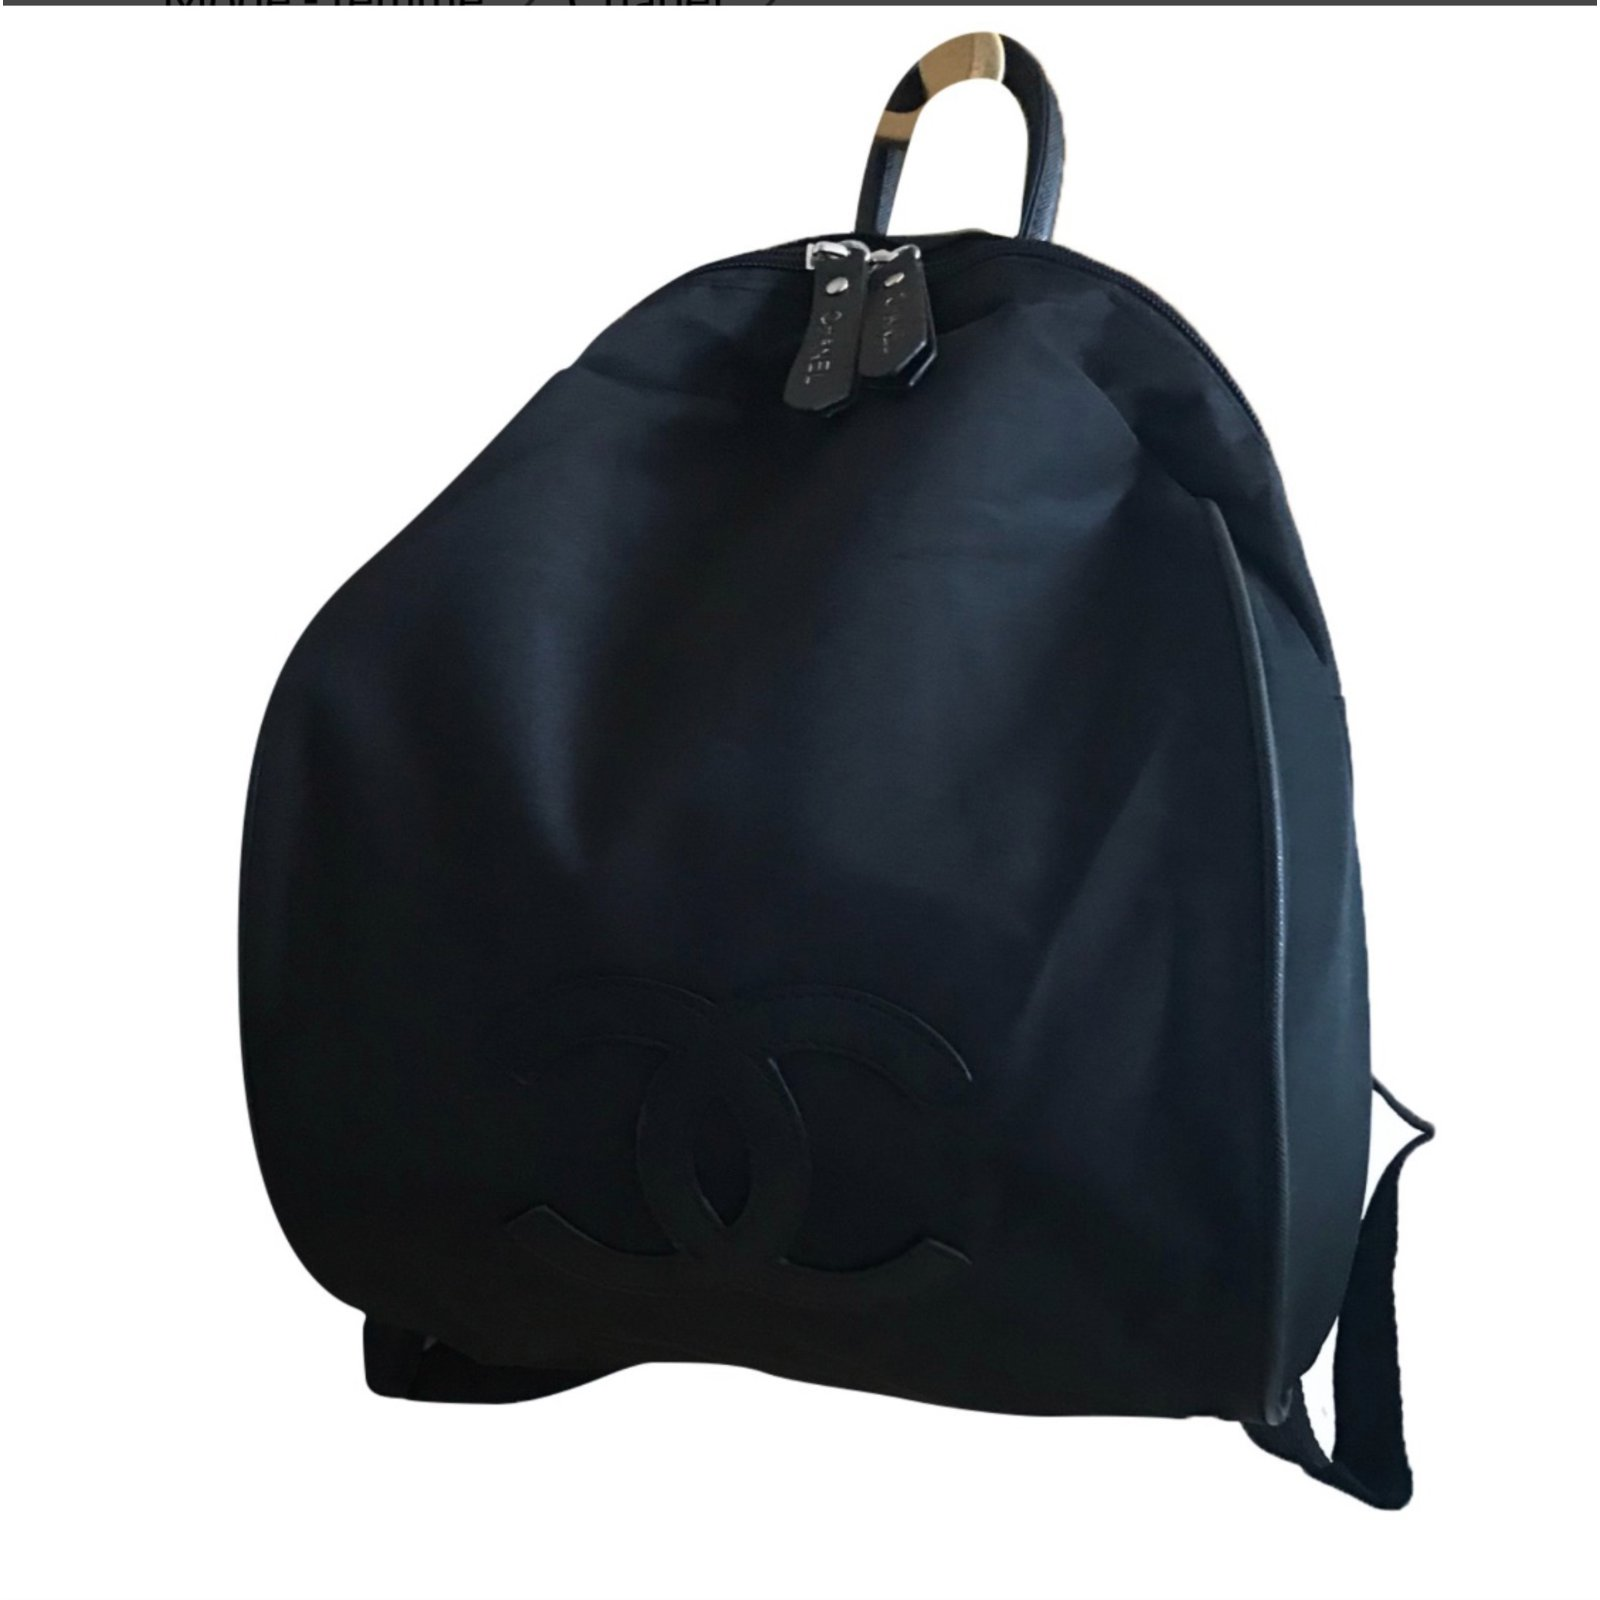 78ff80f6de8c Chanel backpacks vip gifts cloth black ref joli closet jpg 1600x1600 Black  chanel backpack